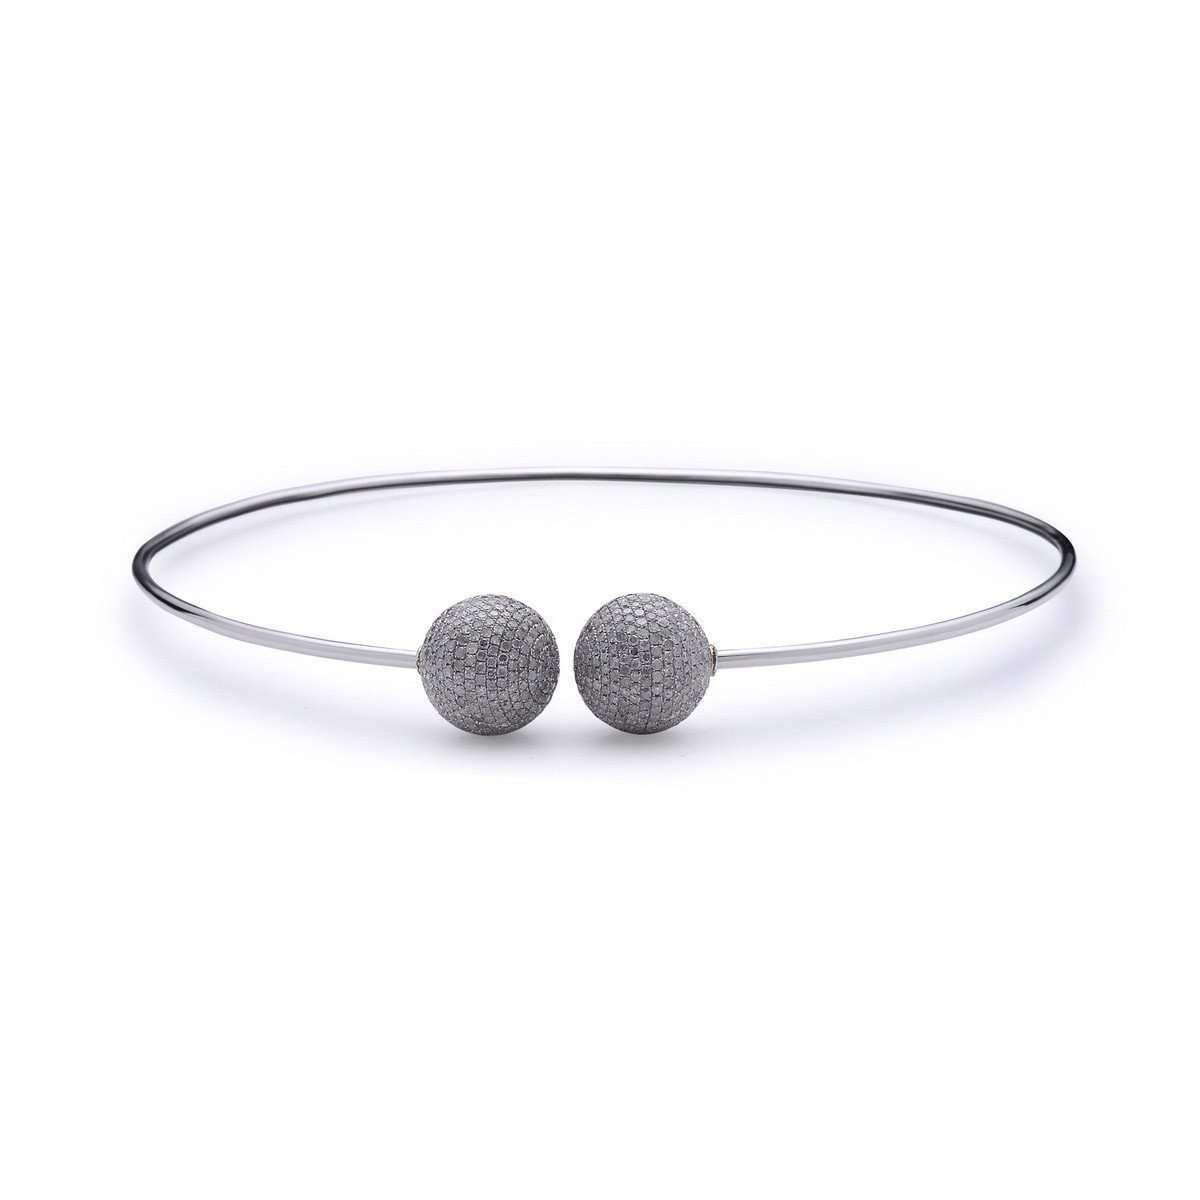 Socheec Spherical Open-ended Diamond Bangle Necklace K98B3Vr